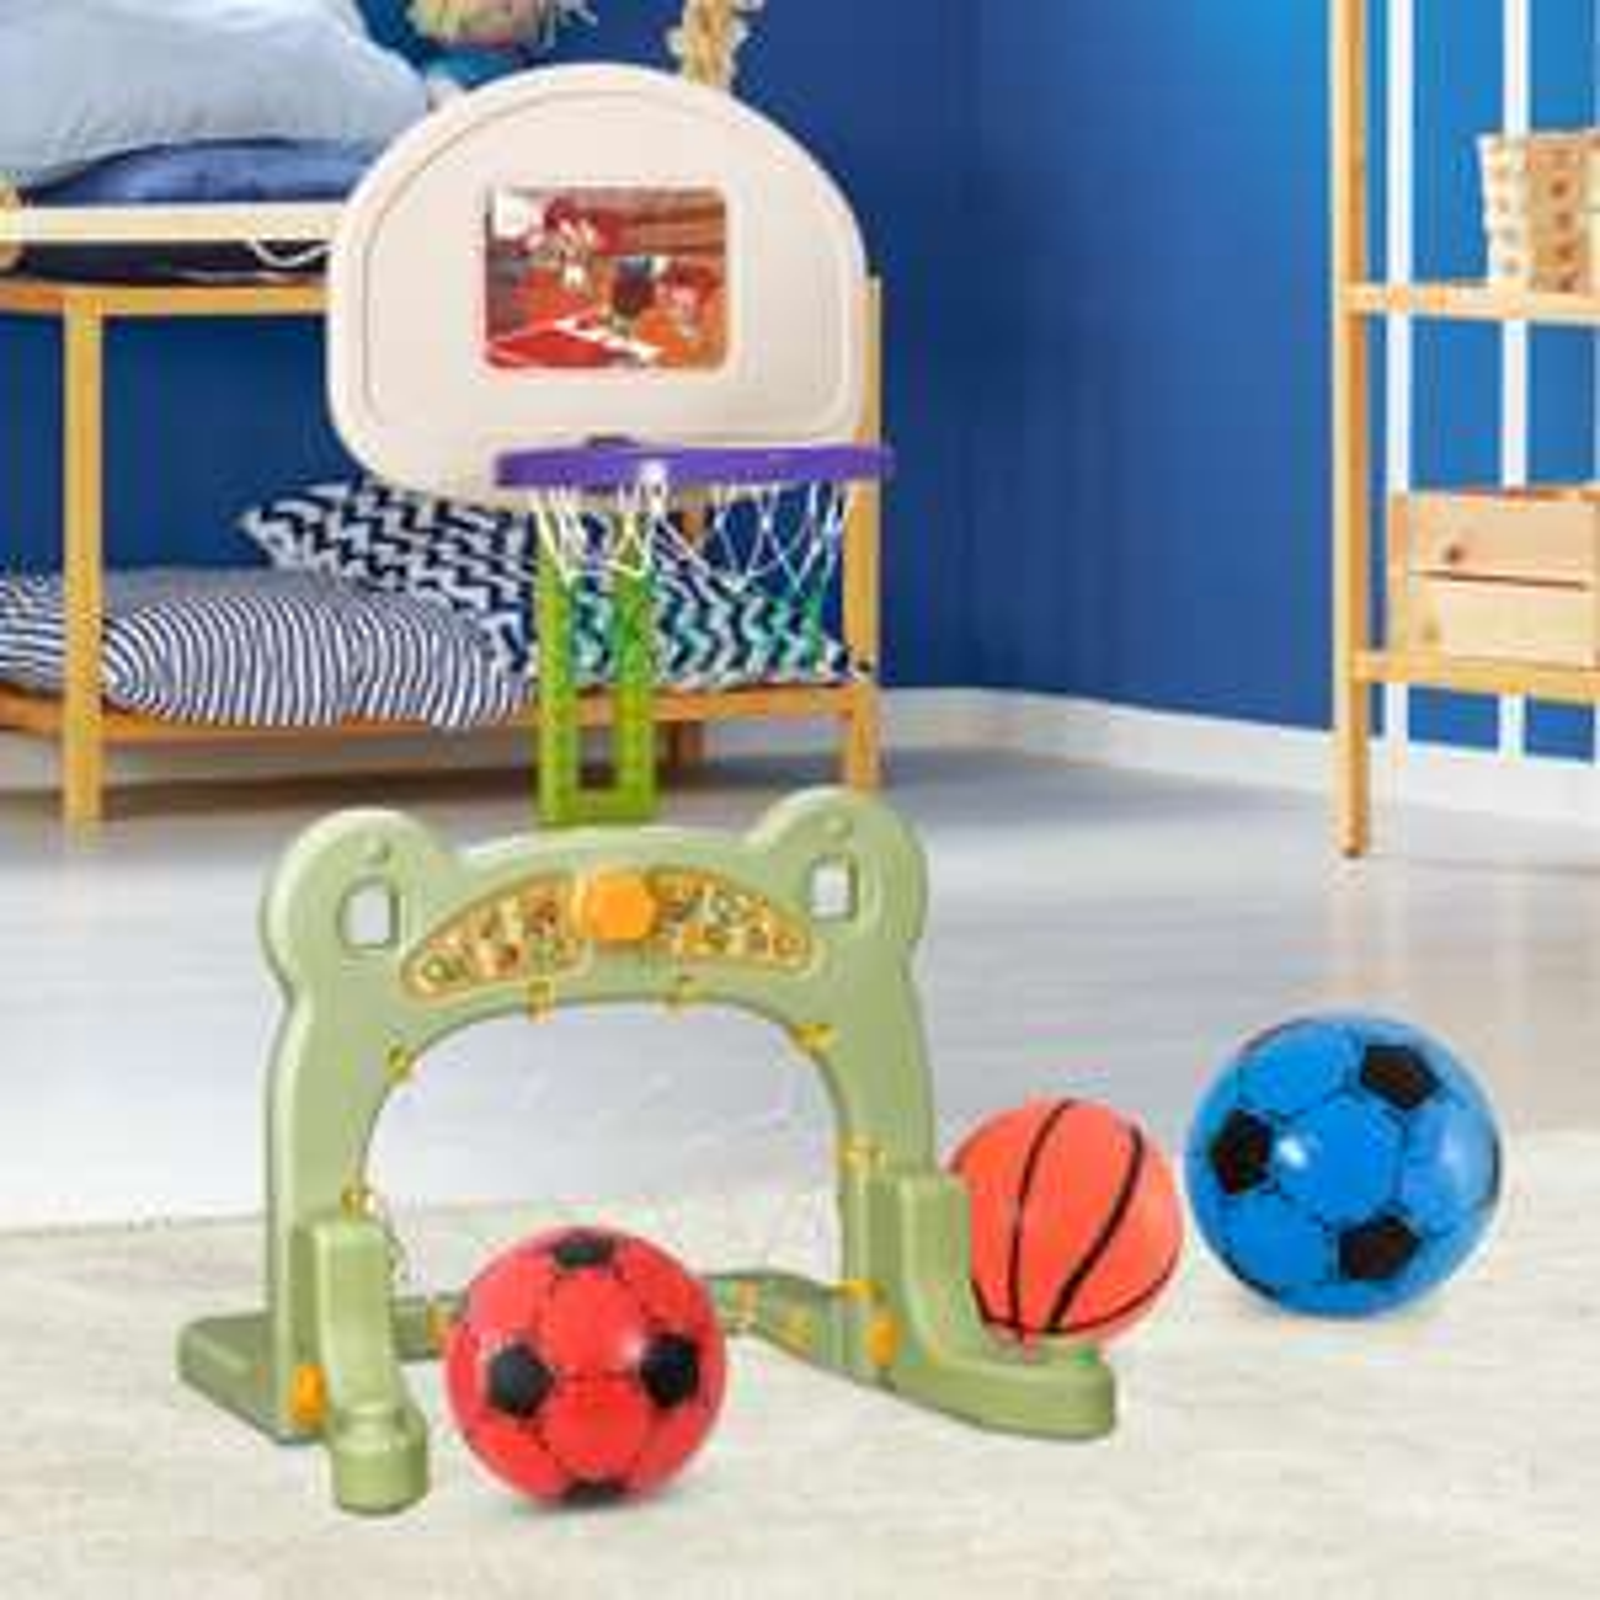 HOMCOM® 2 in 1 Fußball Basketball Basketballkorb Kinder Spielzeug